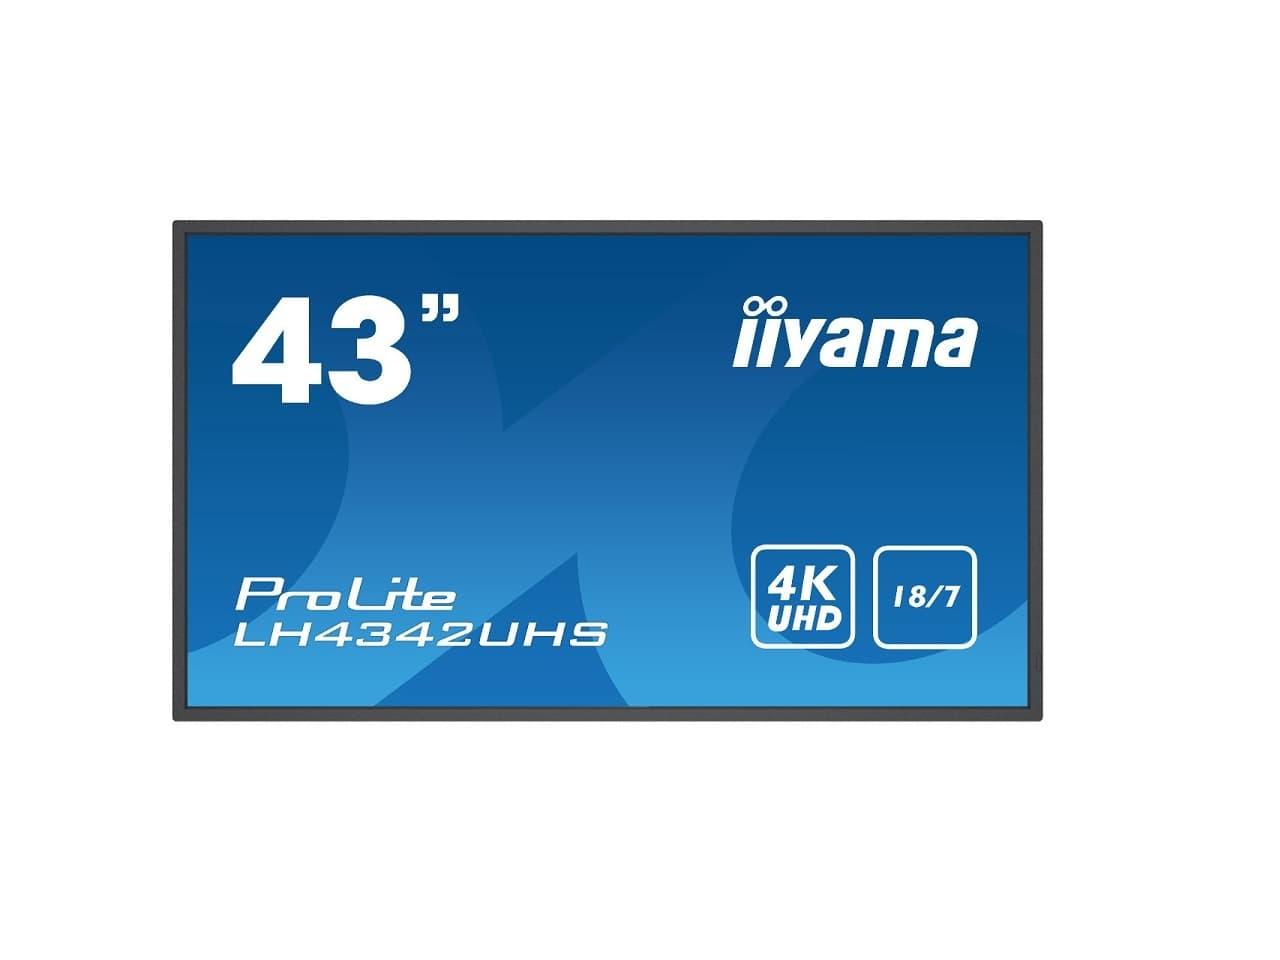 LH4342UHS digital signage kijelzo 2 Vizuáltechnika bolt